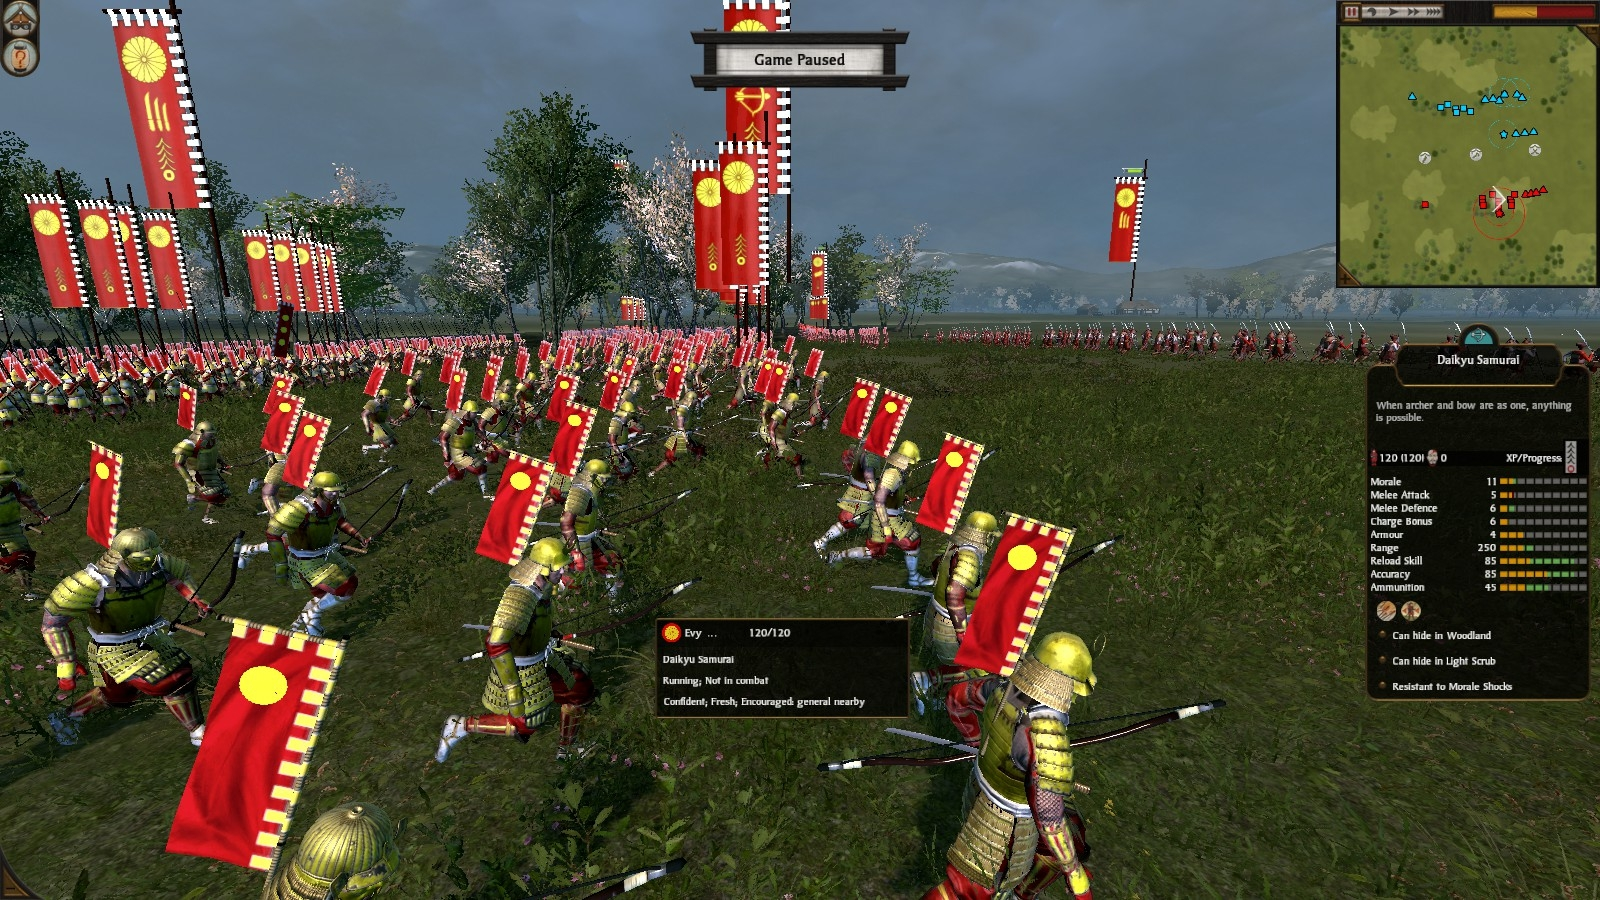 http://54.191.57.178/wp-content/themes/news-box-lite/0pis/floris-best-troops.html